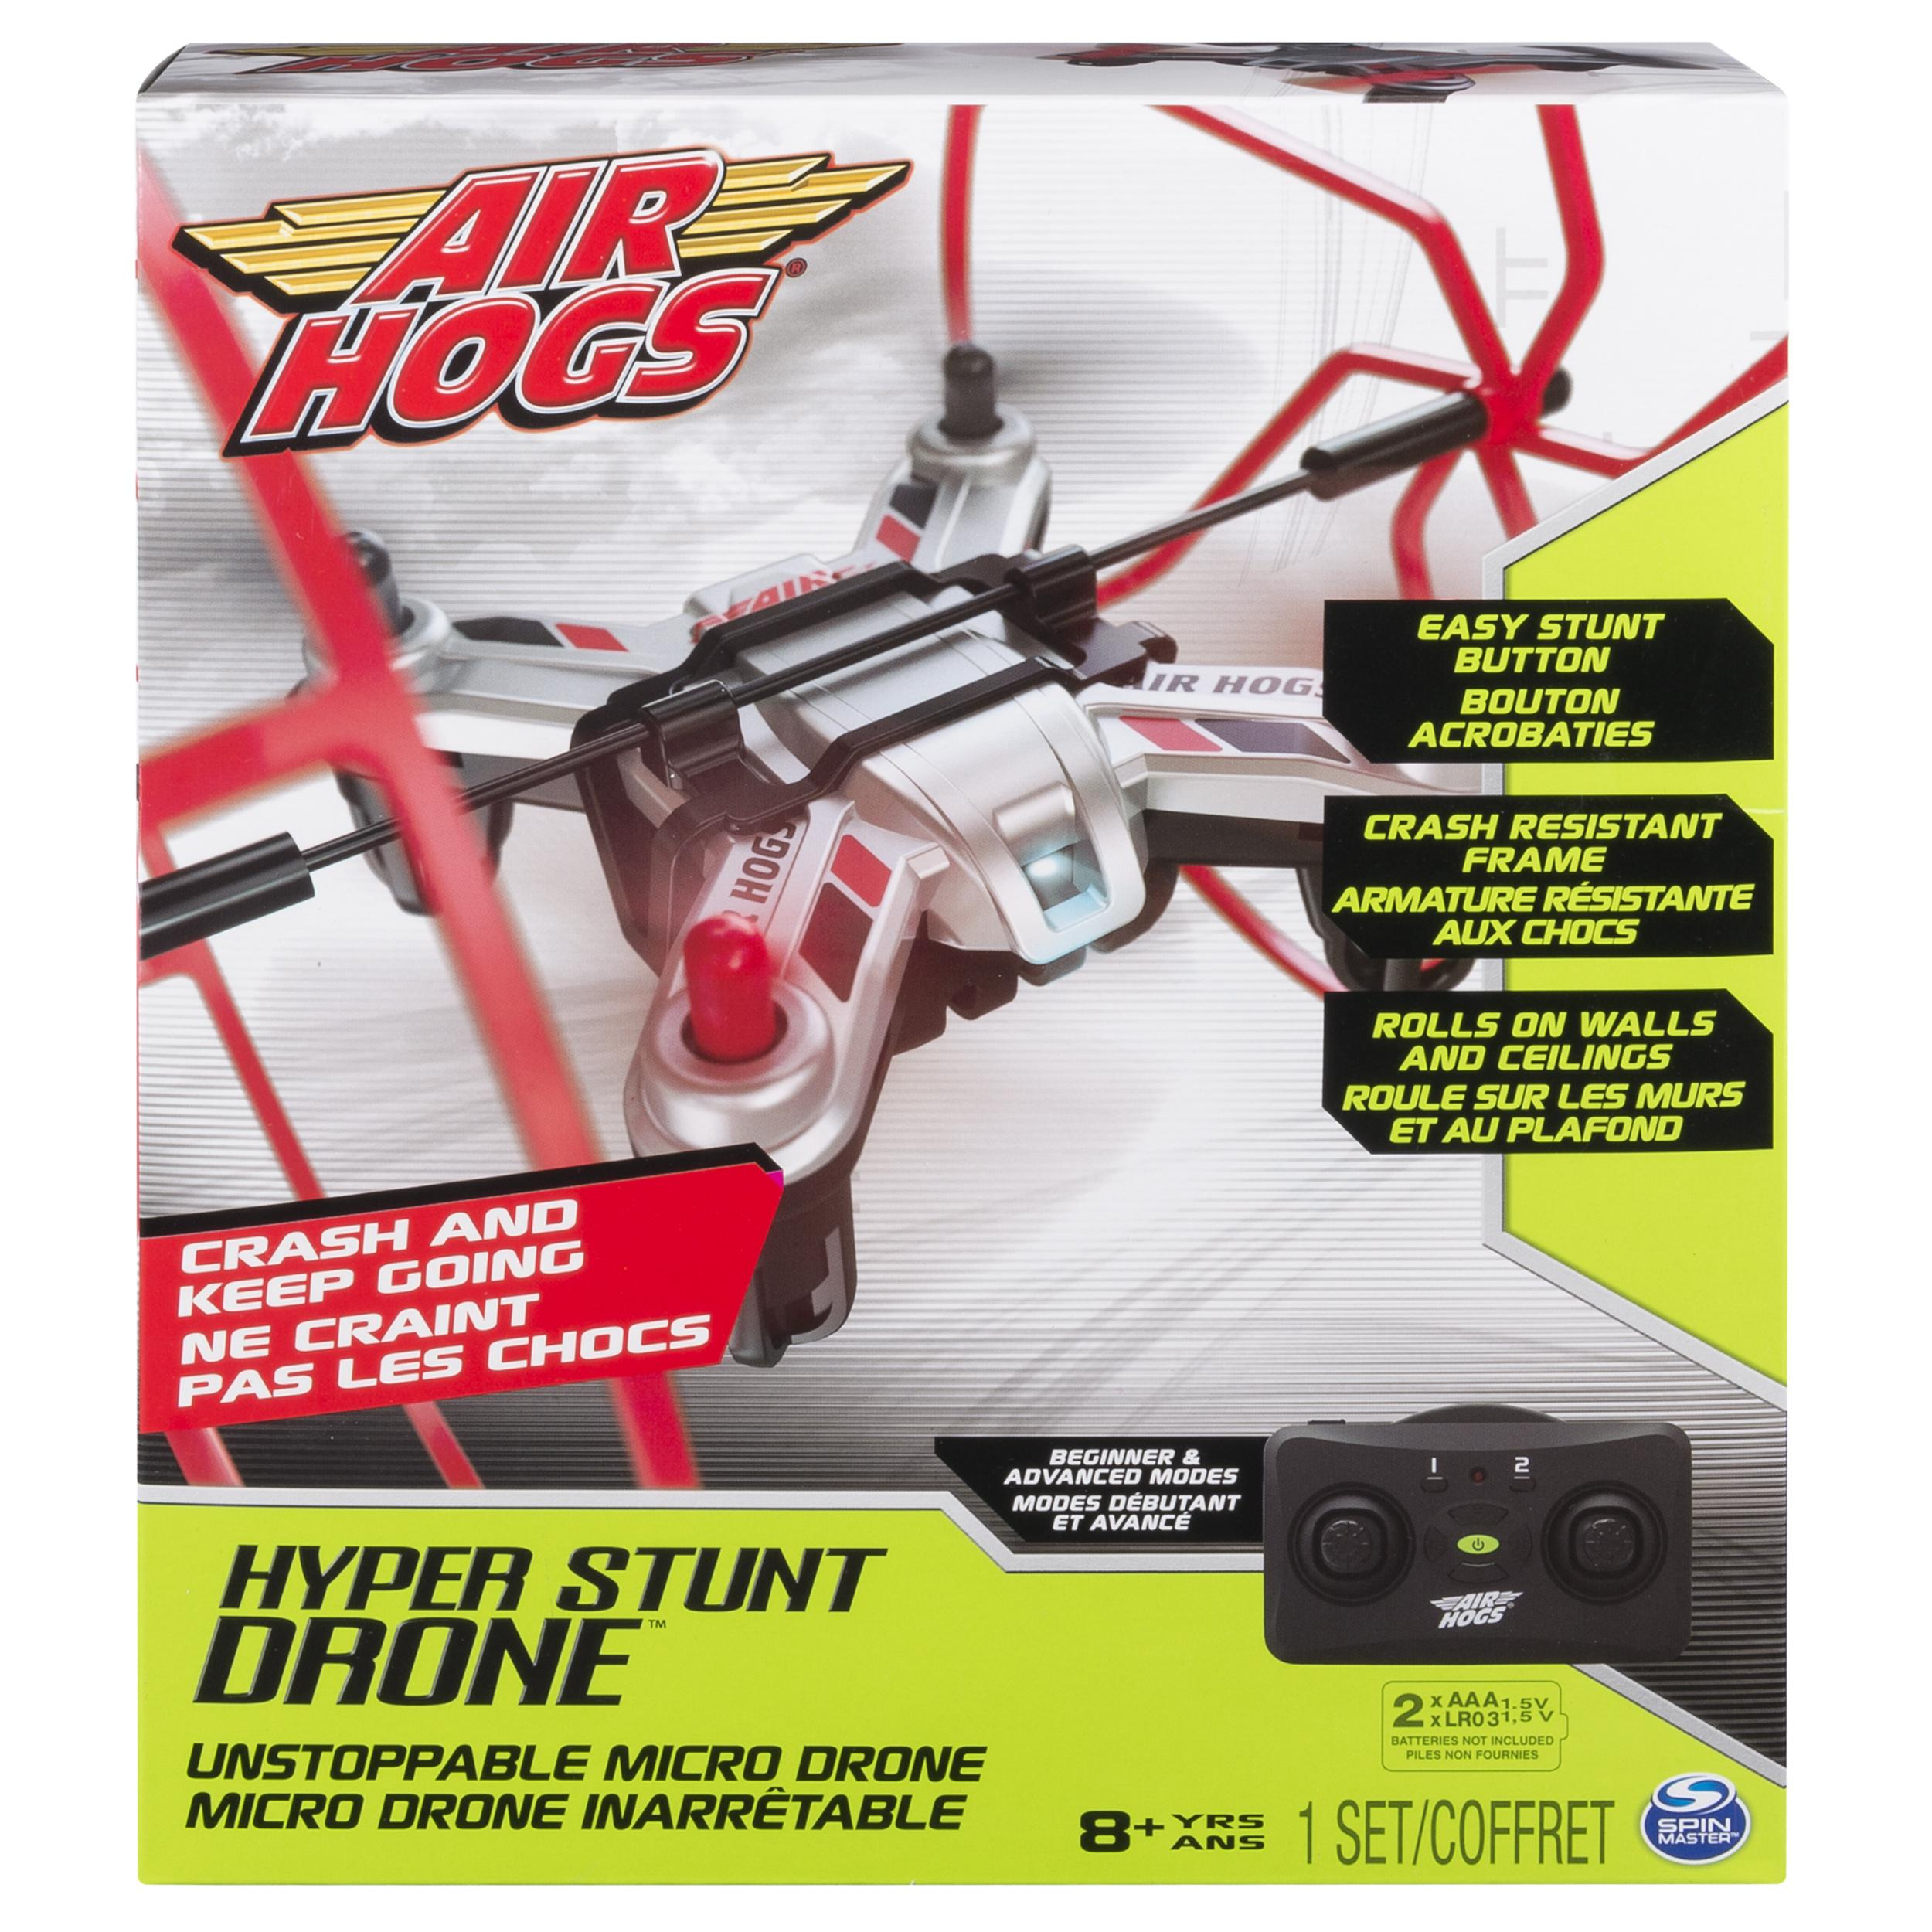 Amazon.com: Air Hogs - Hyper Stunt Drone - Unstoppable Micro RC Drone